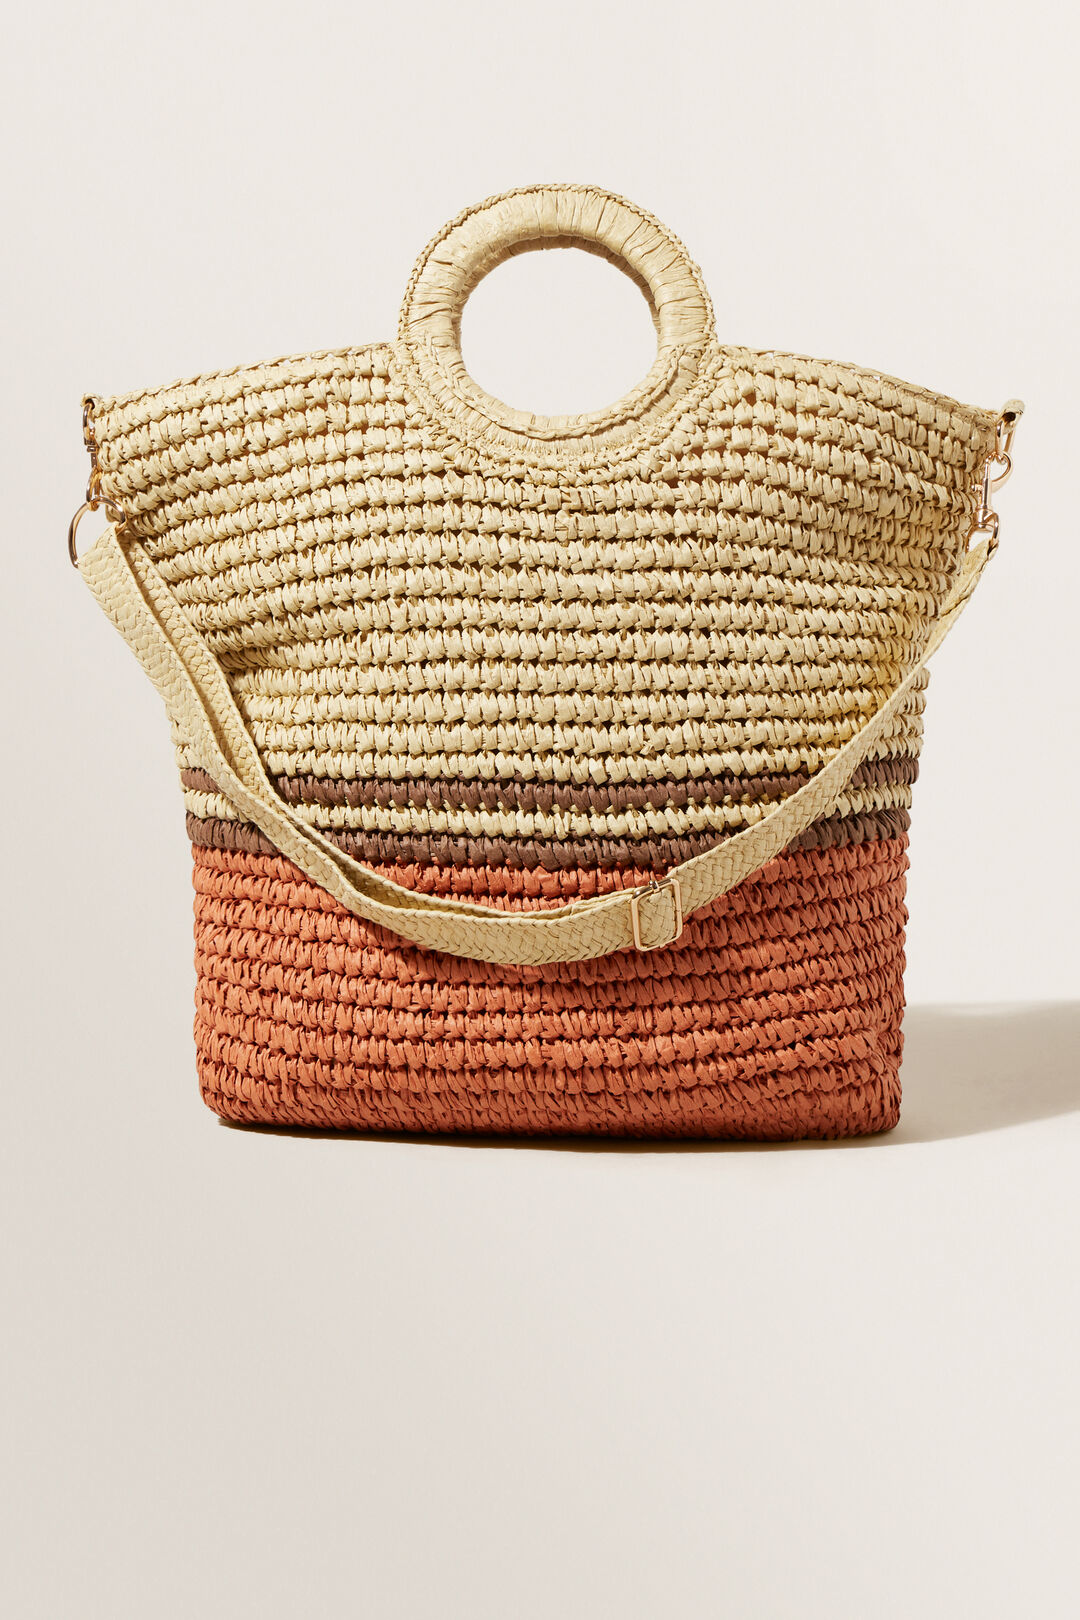 Striped Straw Tote Bag  NEUTRAL SAND MULTI  hi-res